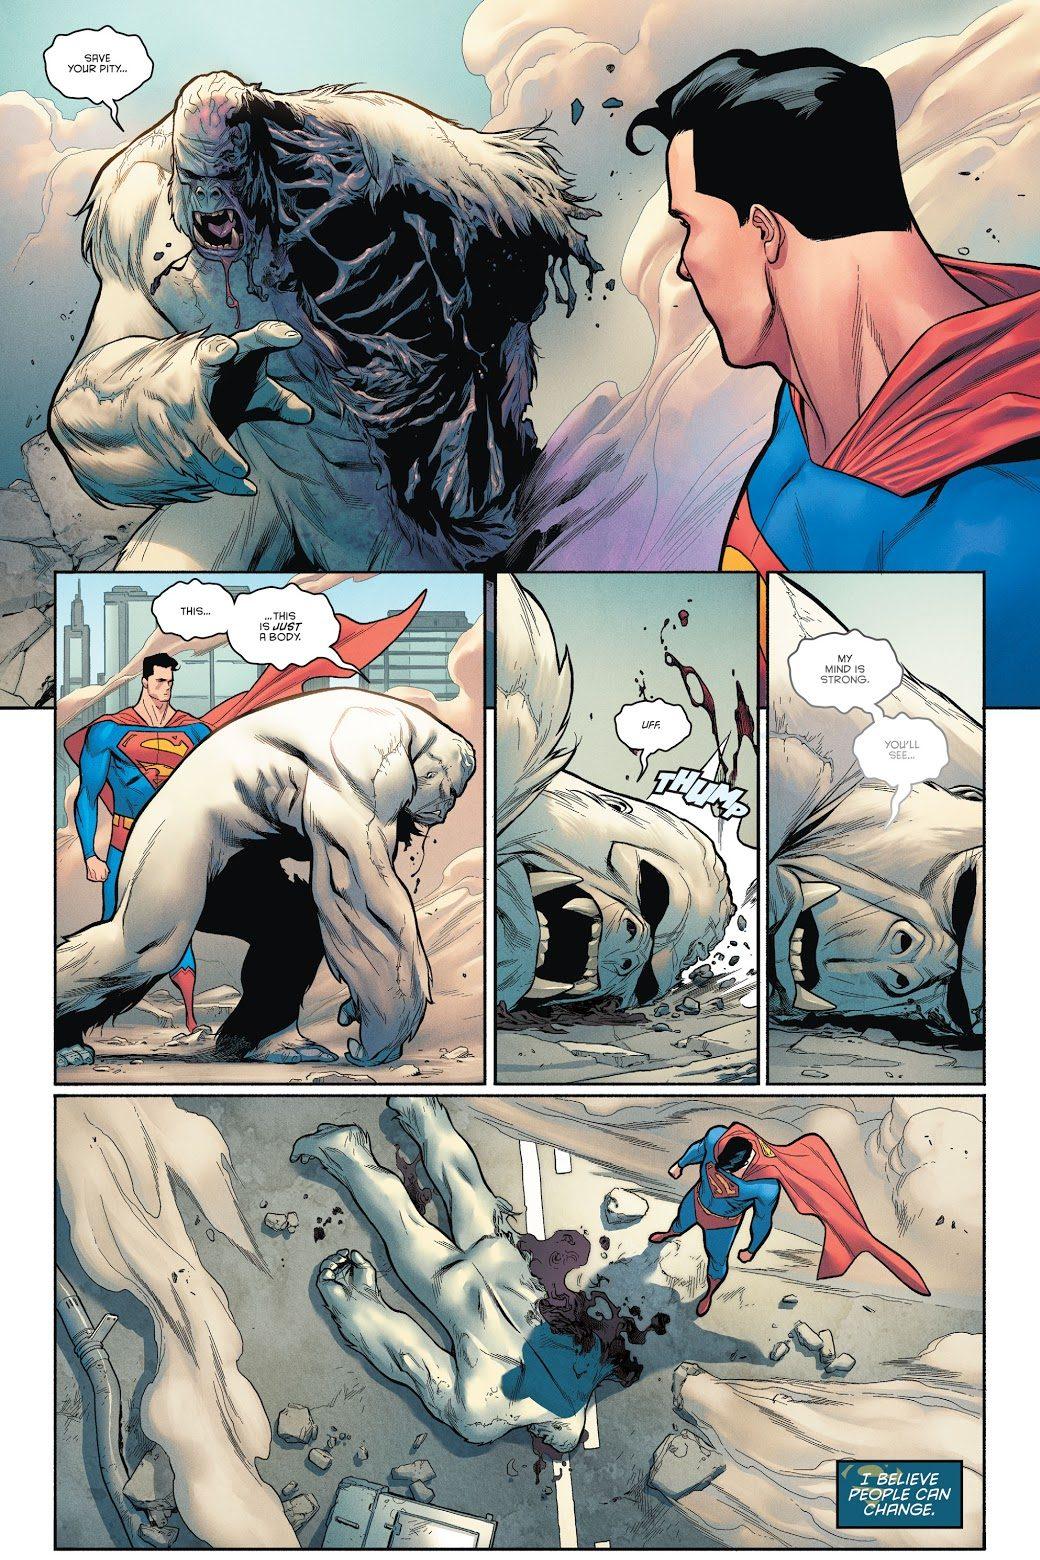 Superman VS Ultra-Humanite